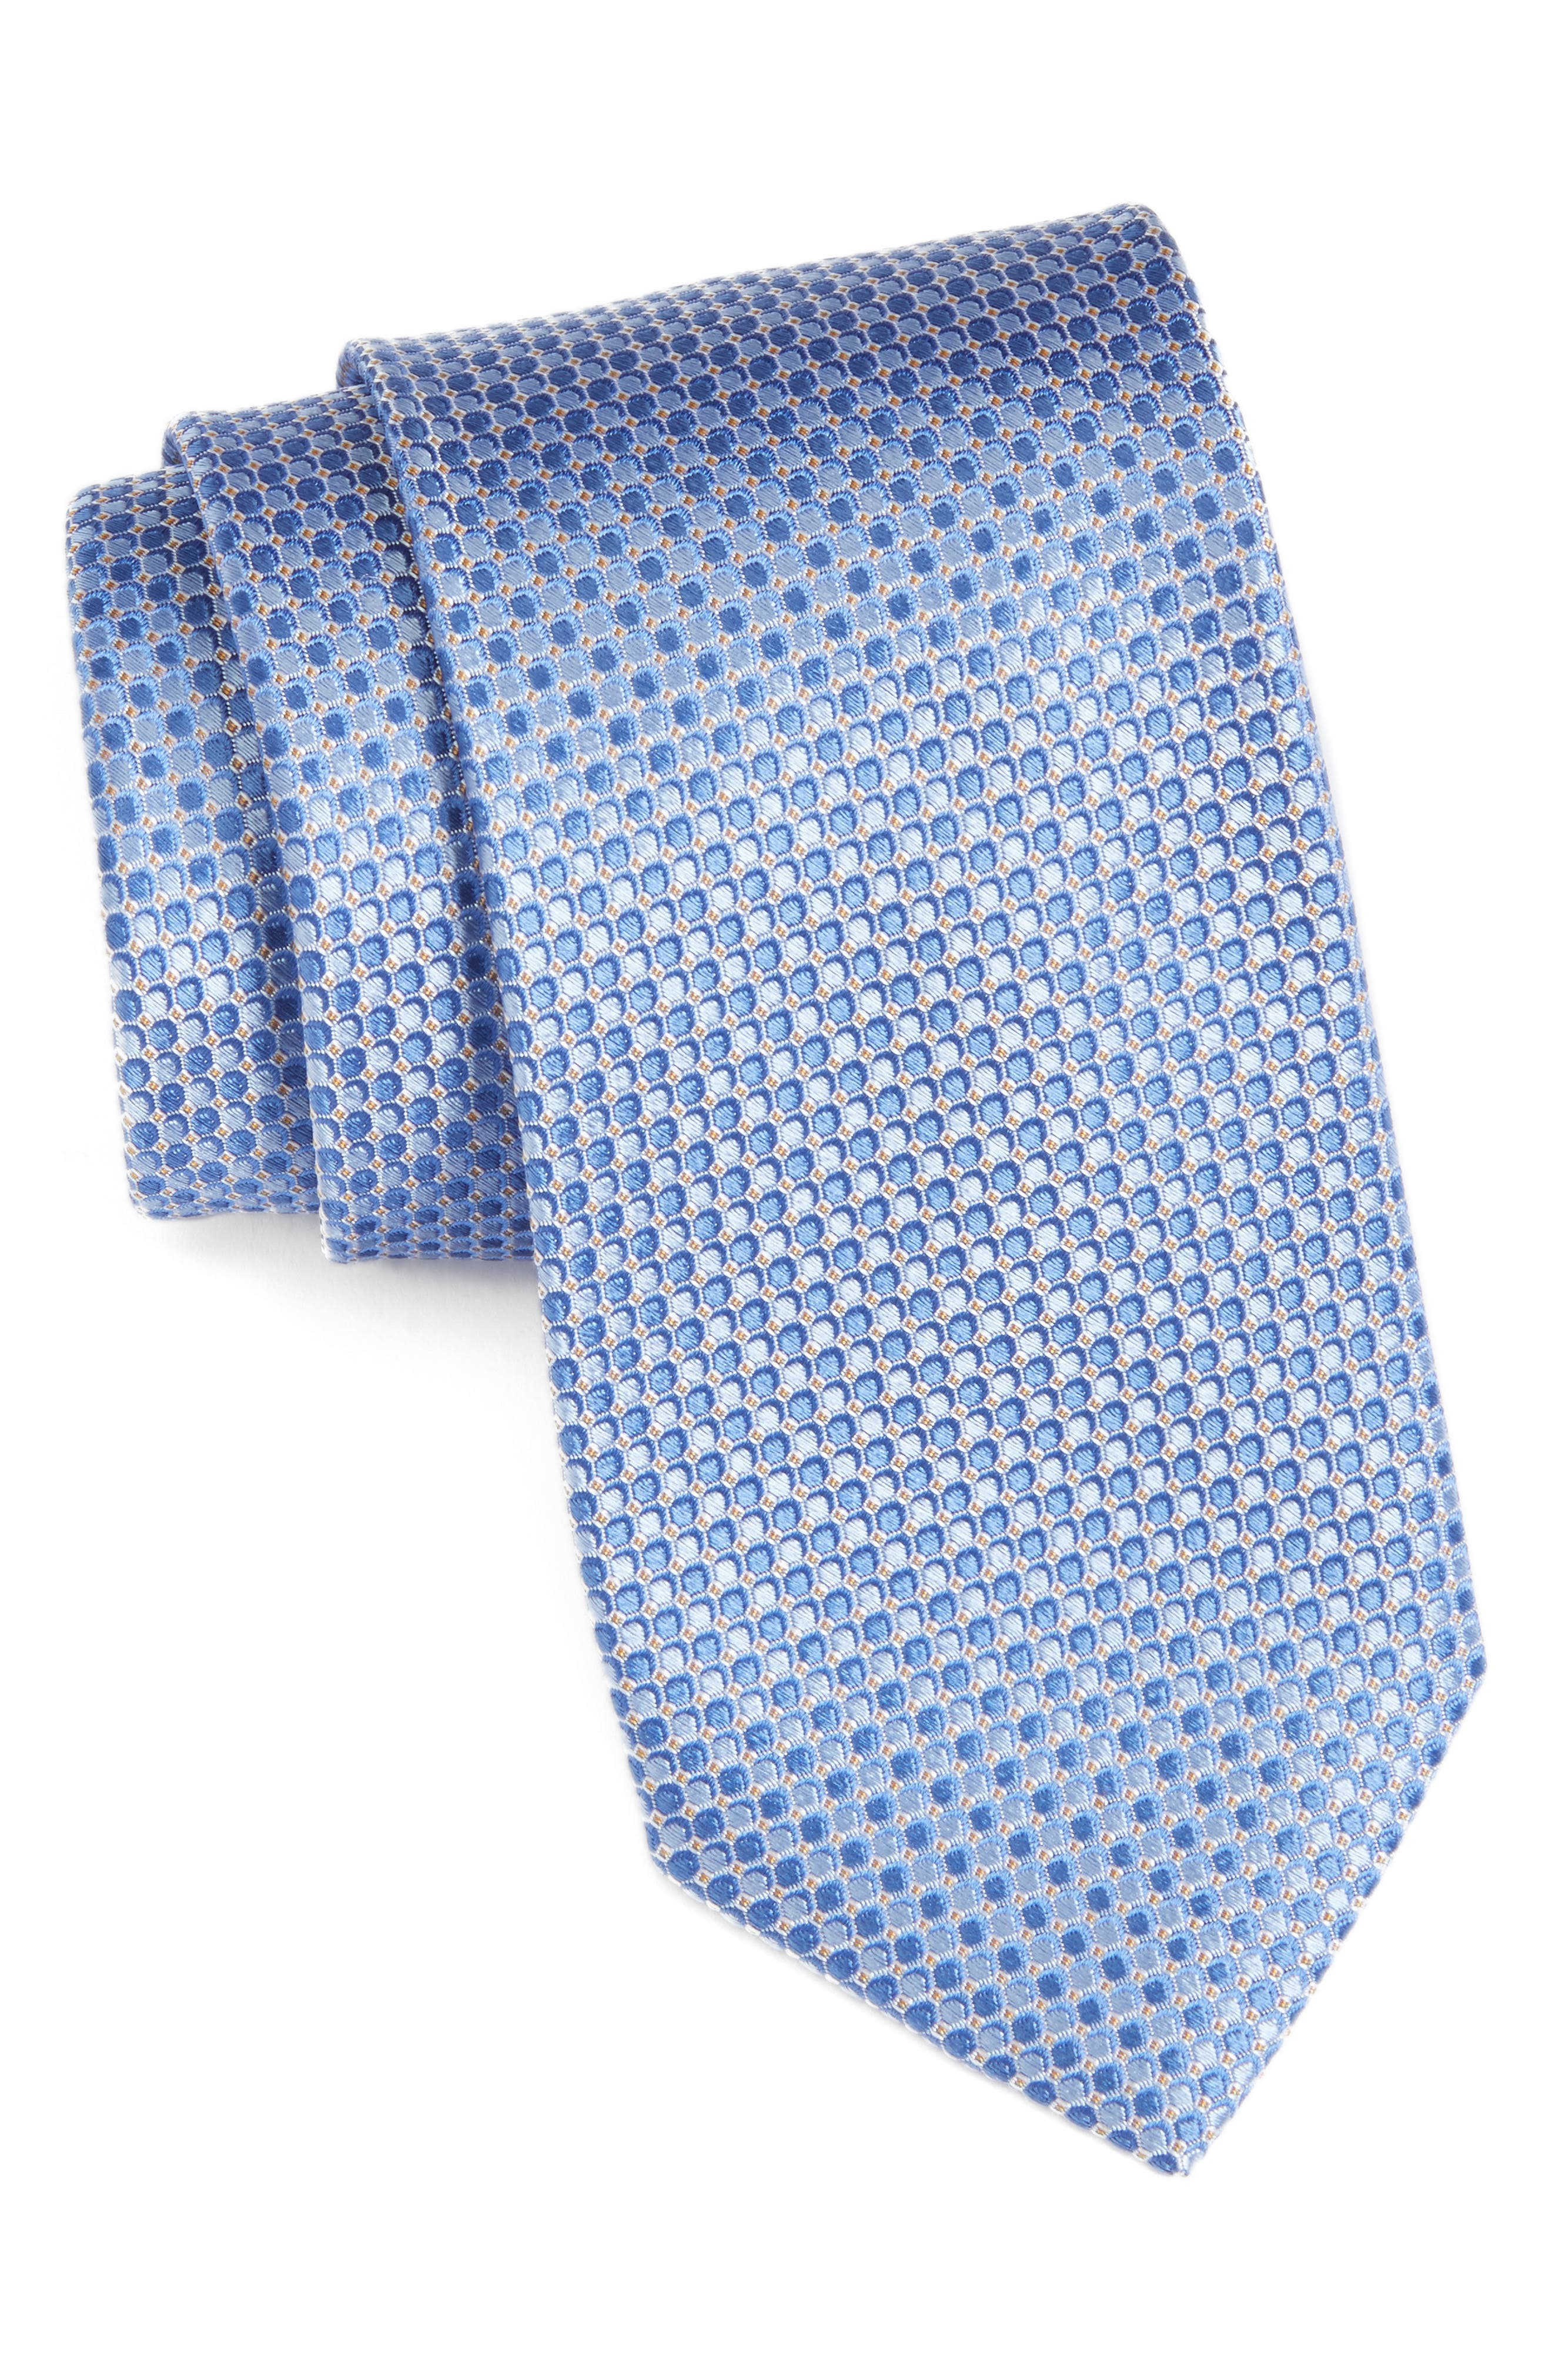 Alghero Micro Silk Tie,                             Main thumbnail 1, color,                             455